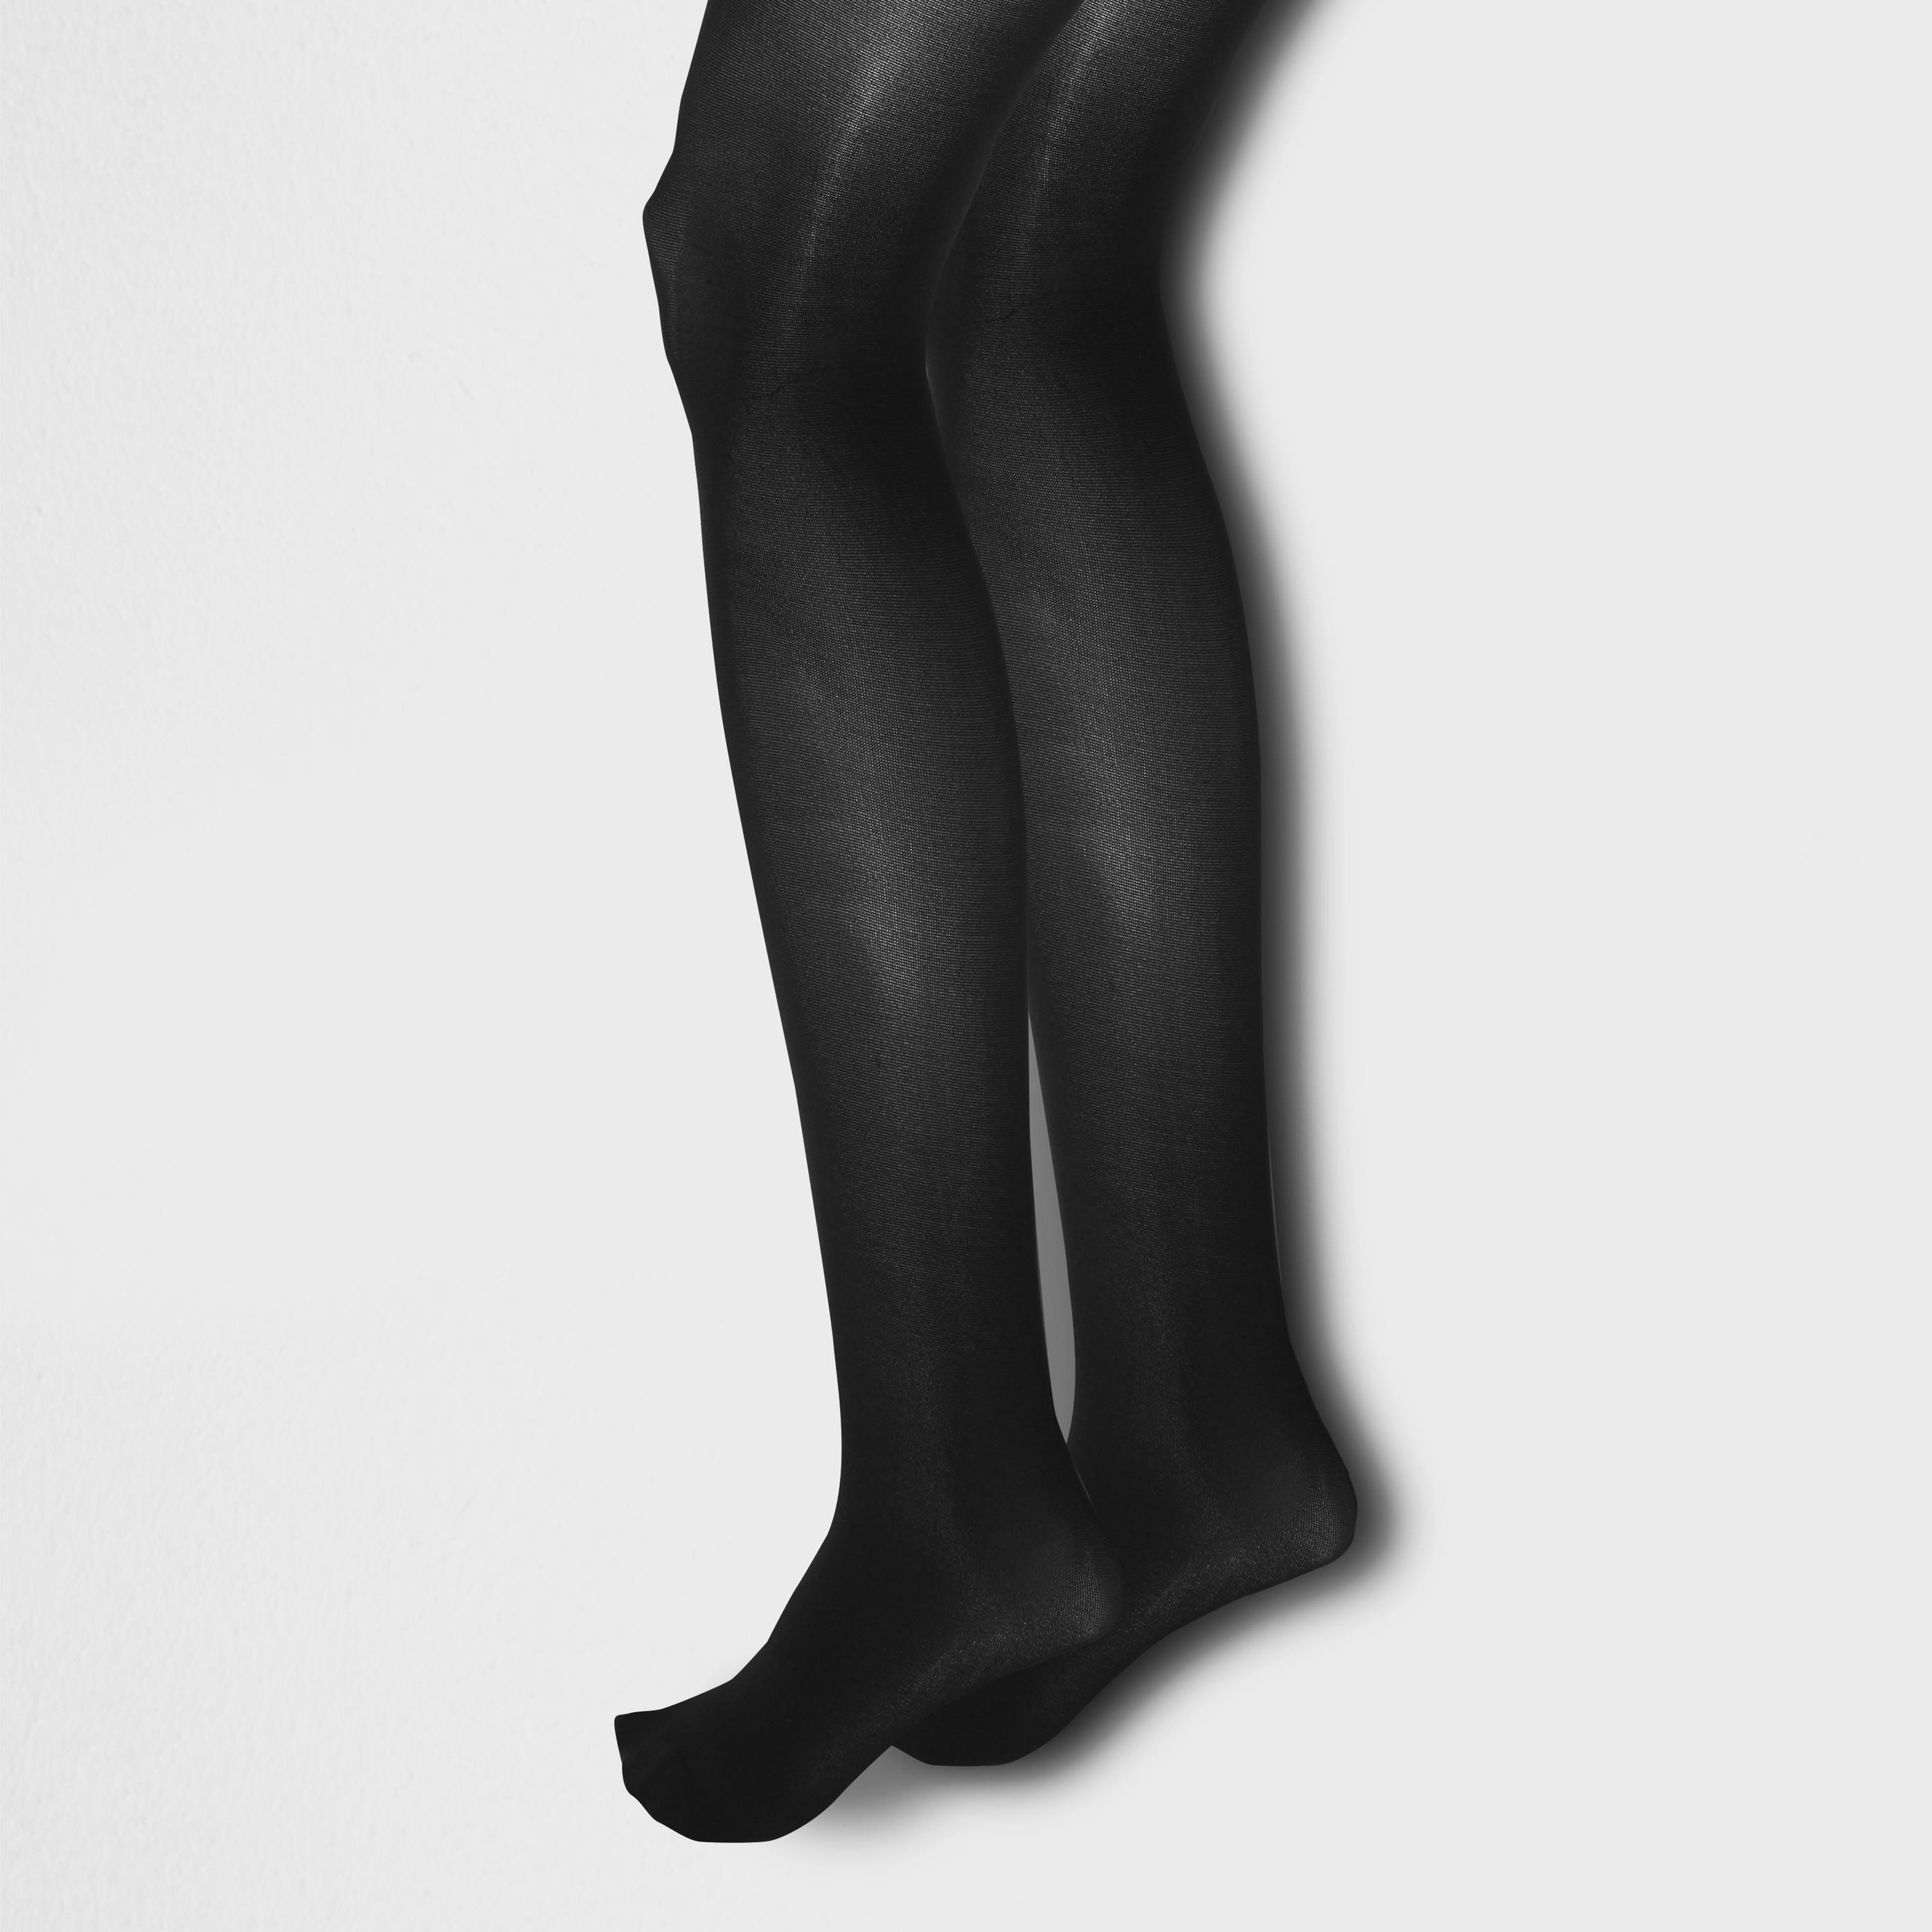 447e8912c10 Womens Black 40 denier tights multipack - £6.00 - Bullring   Grand Central